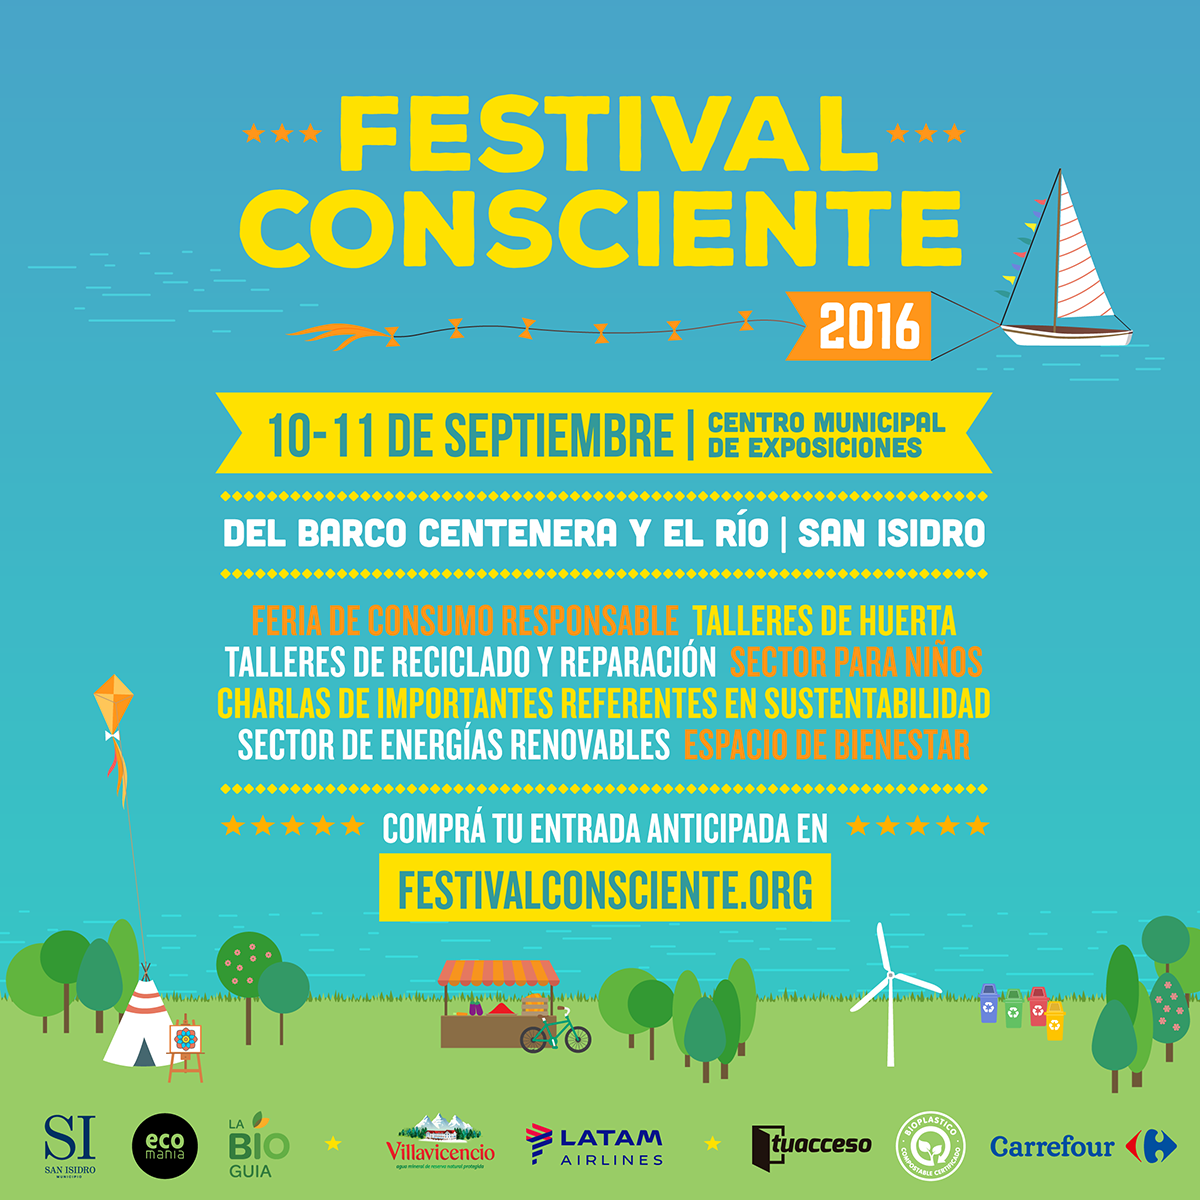 Festival Consciente 2016